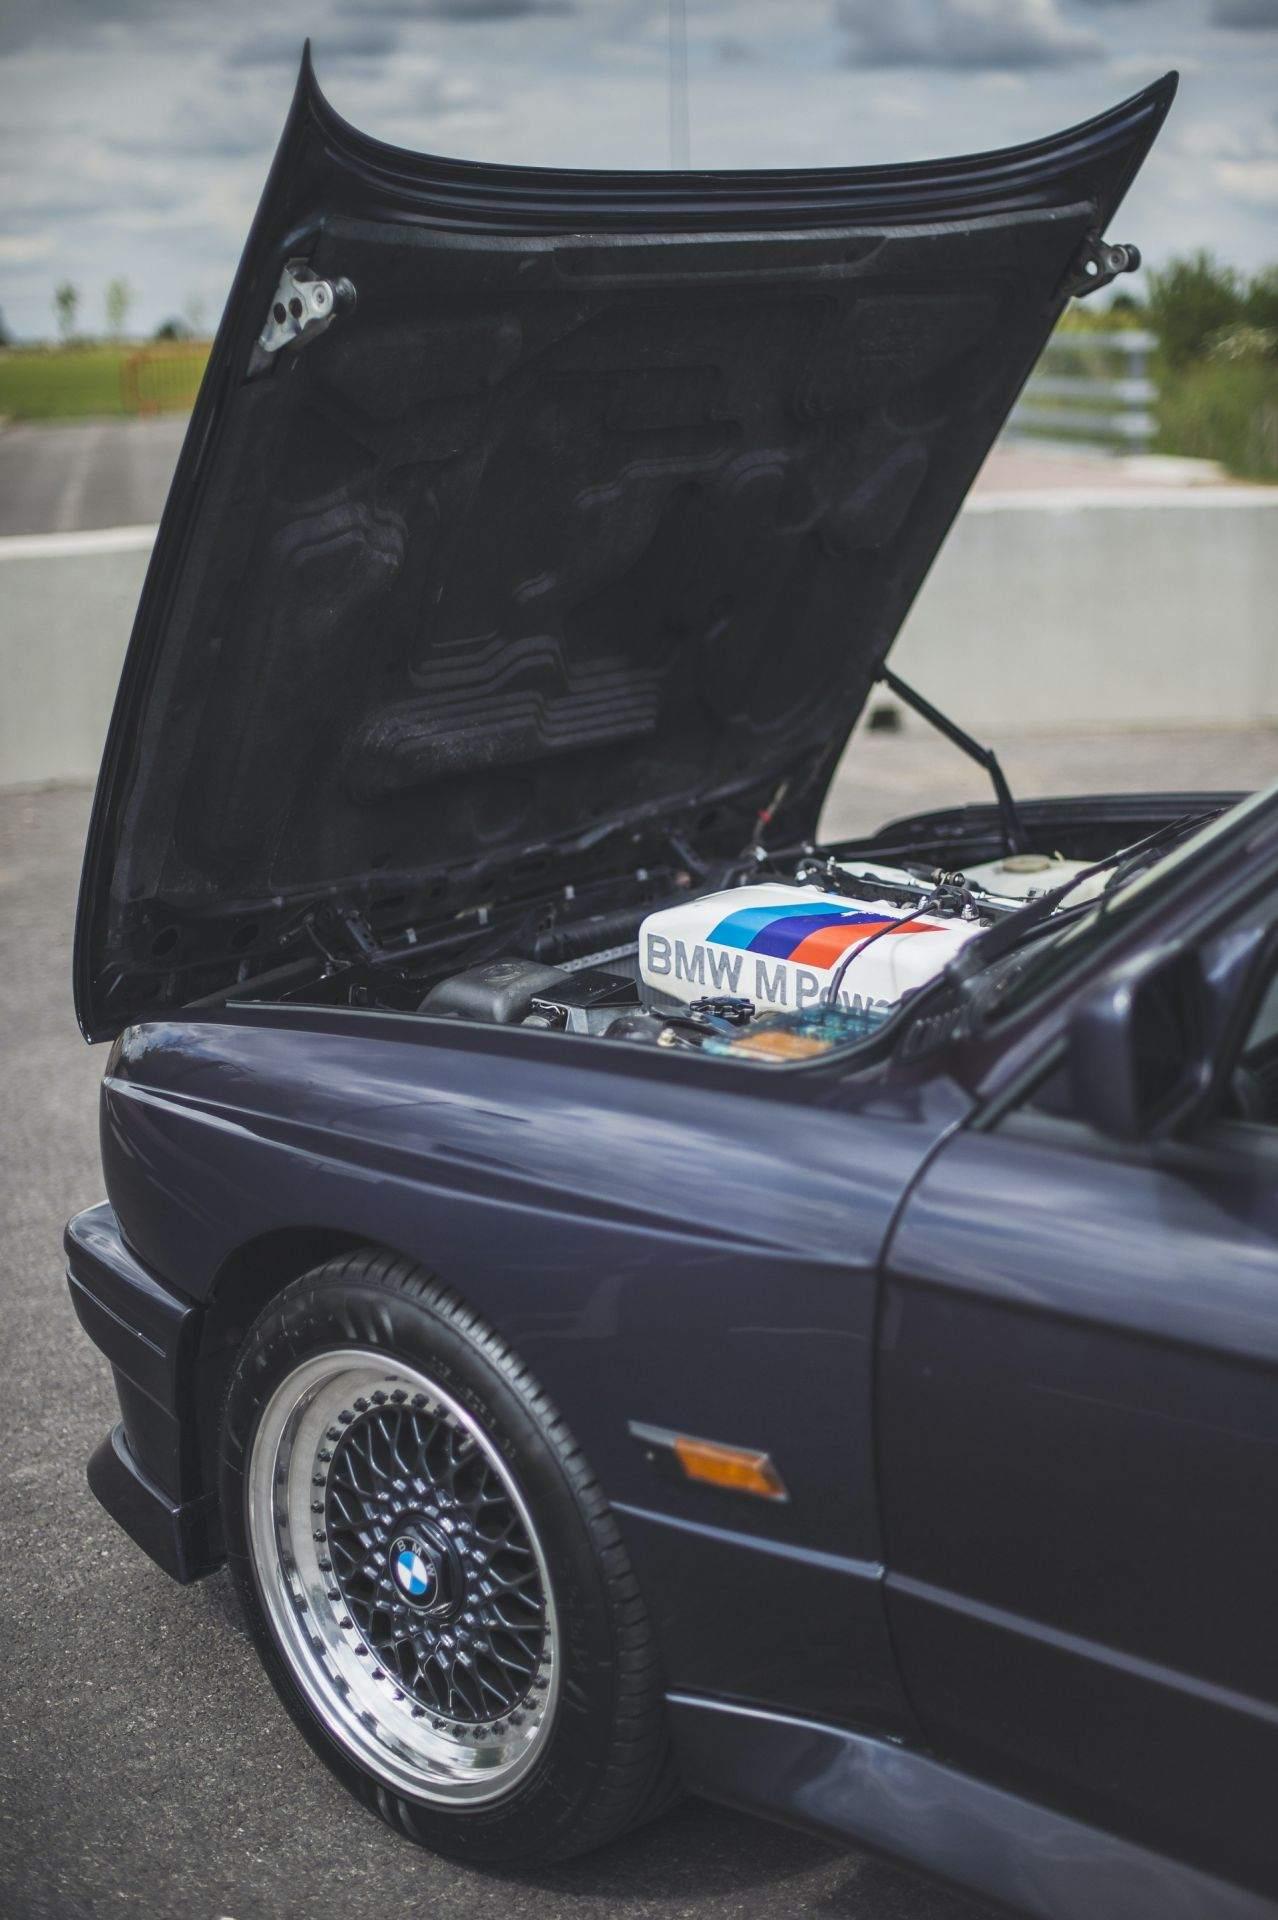 BMW_M3_Evo_II_sale_0026